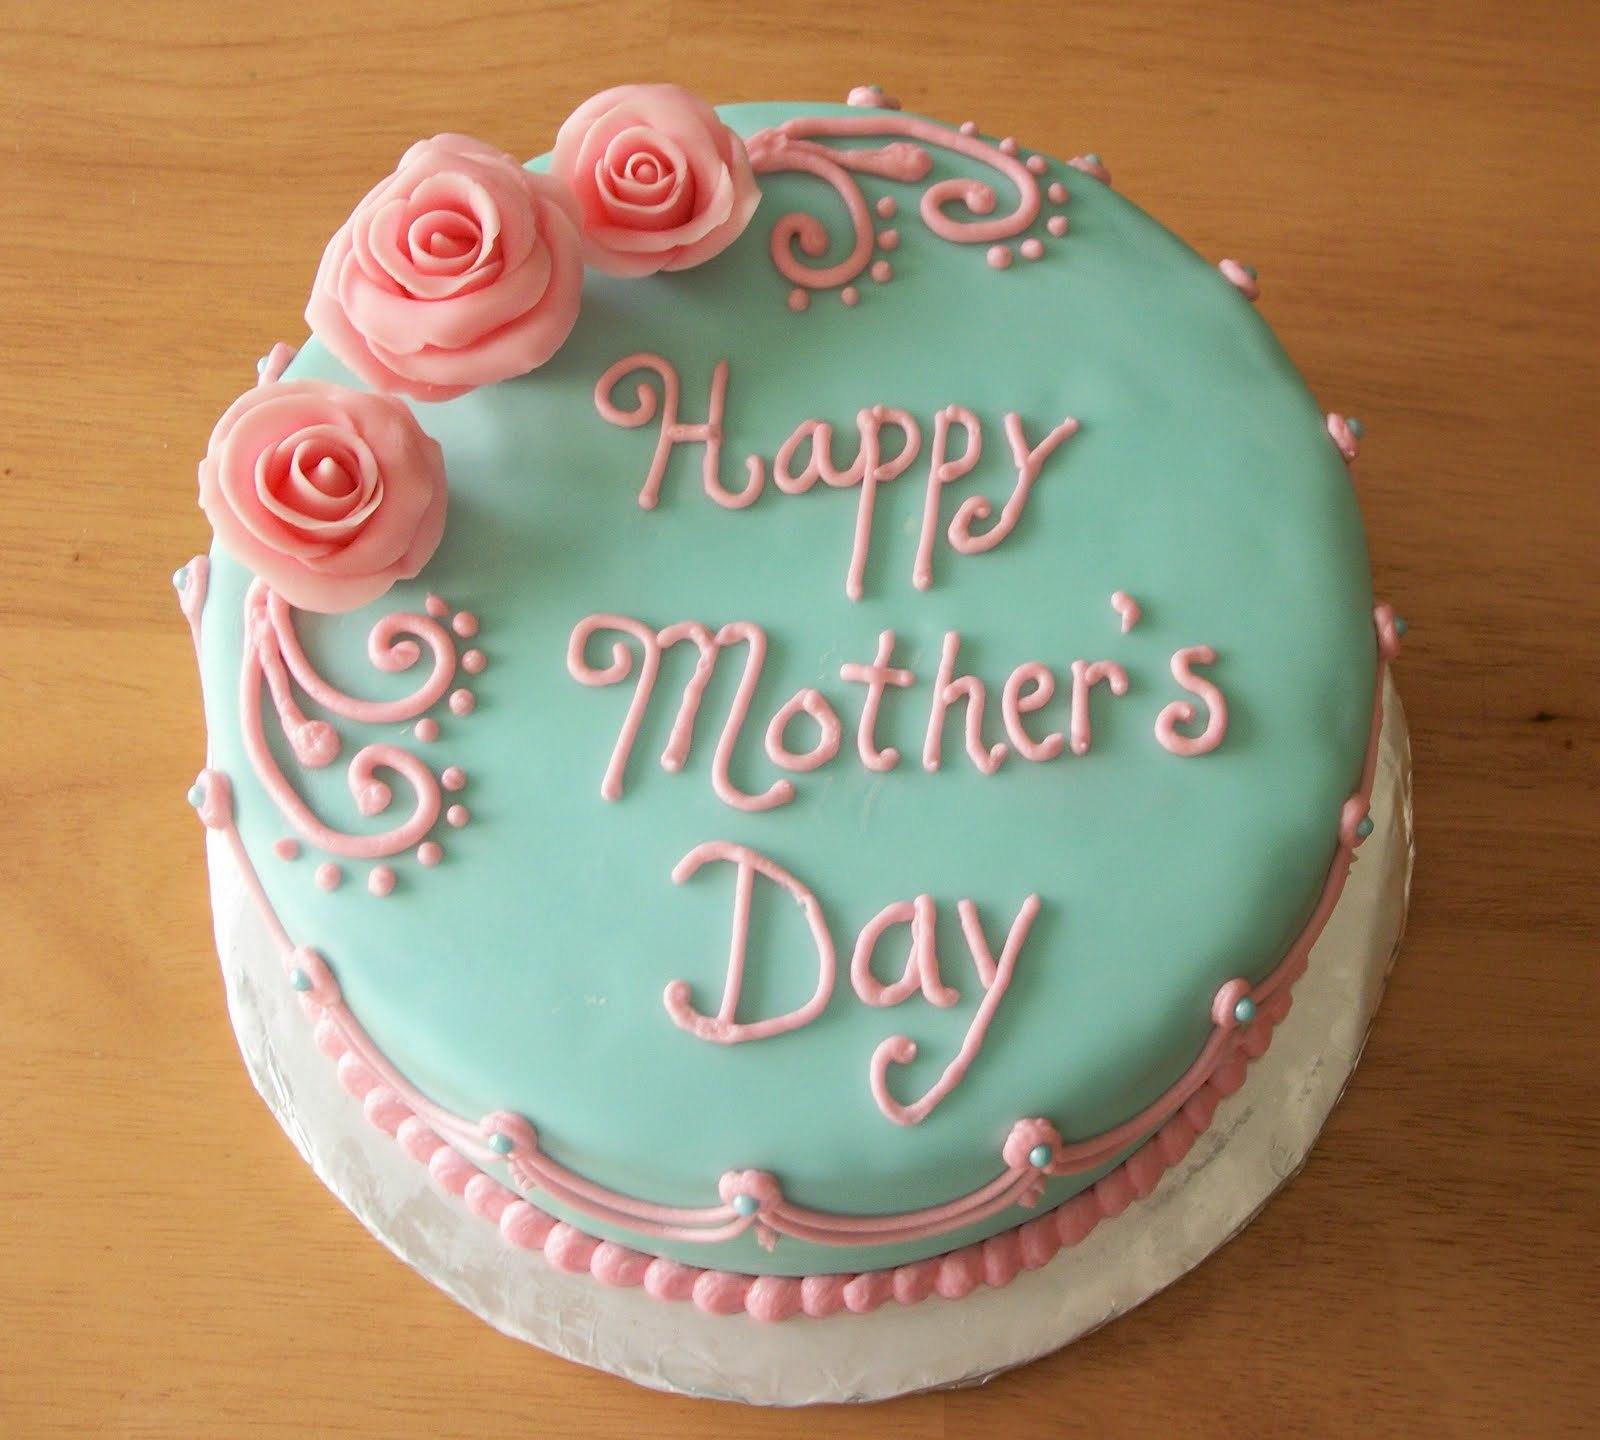 Happy Mother's Day Cake Photos